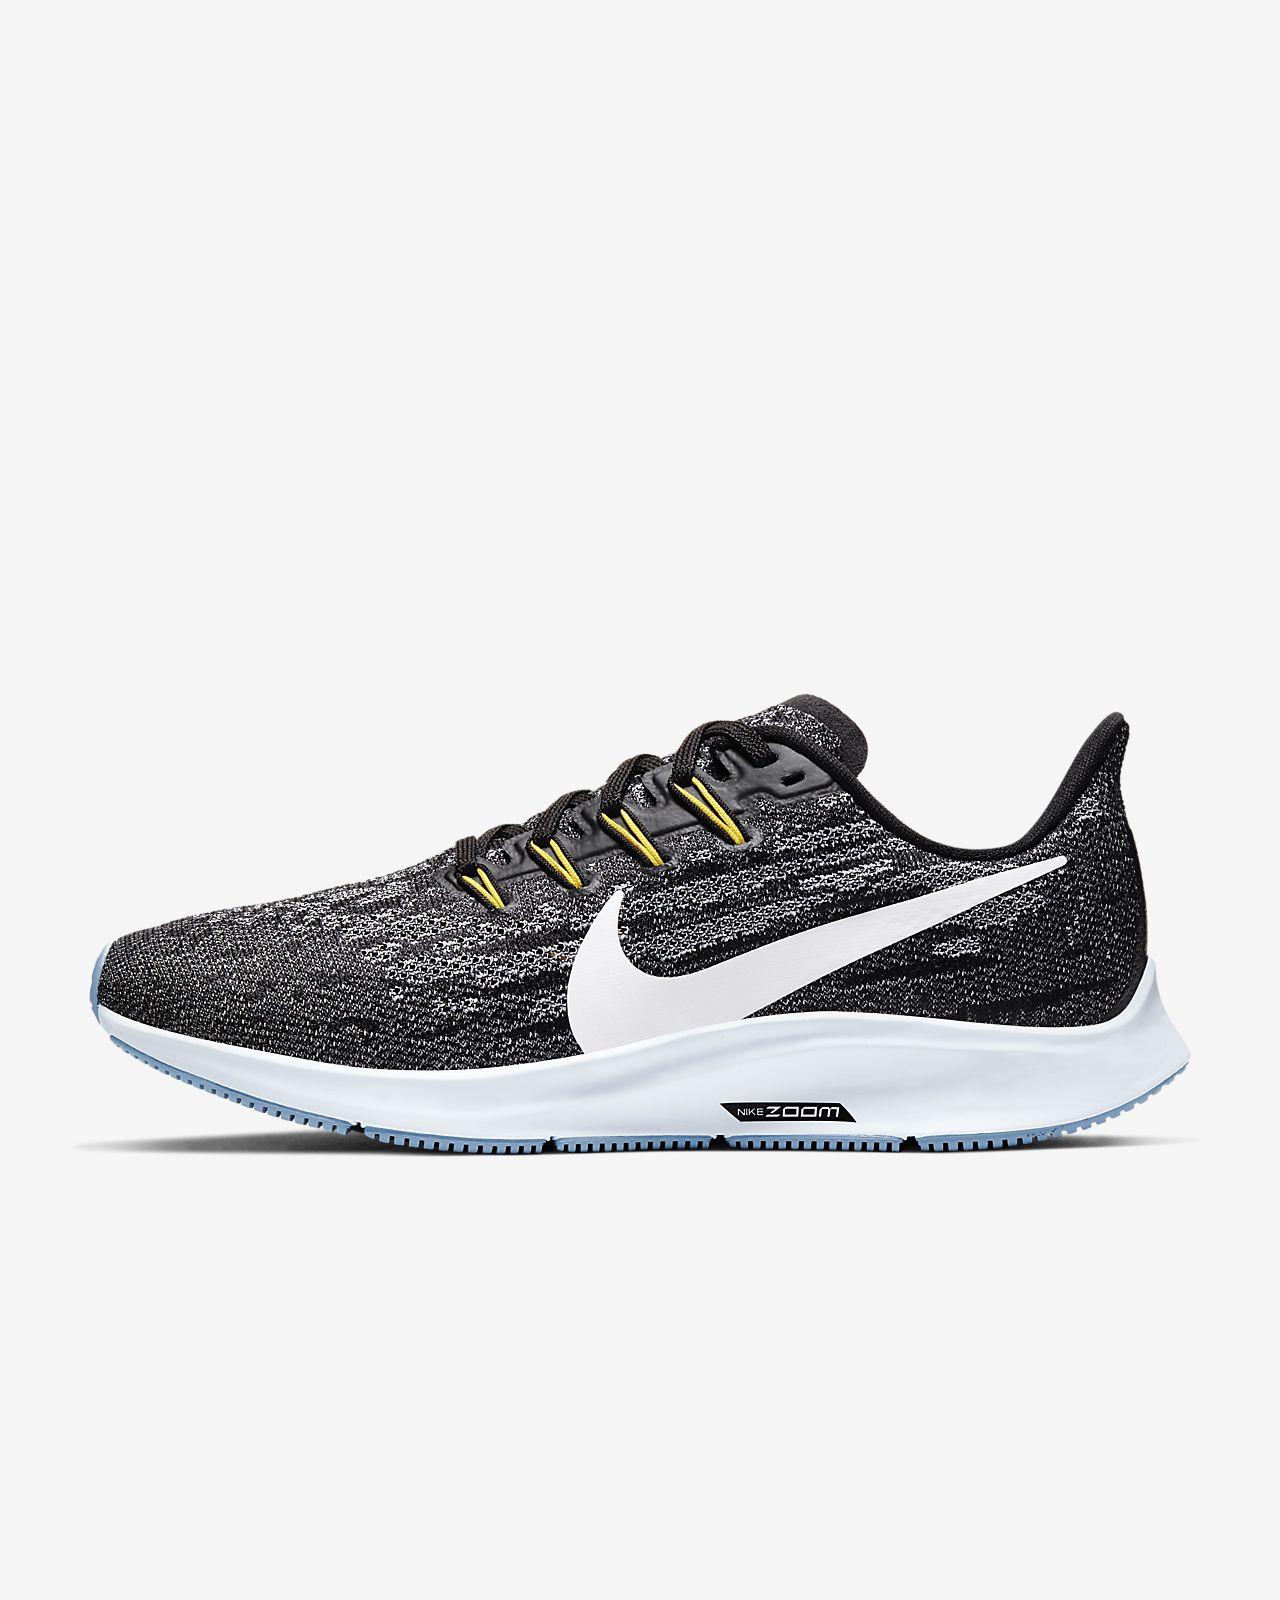 huge sale best place closer at Nike Air Zoom Pegasus 36 Damen-Laufschuh